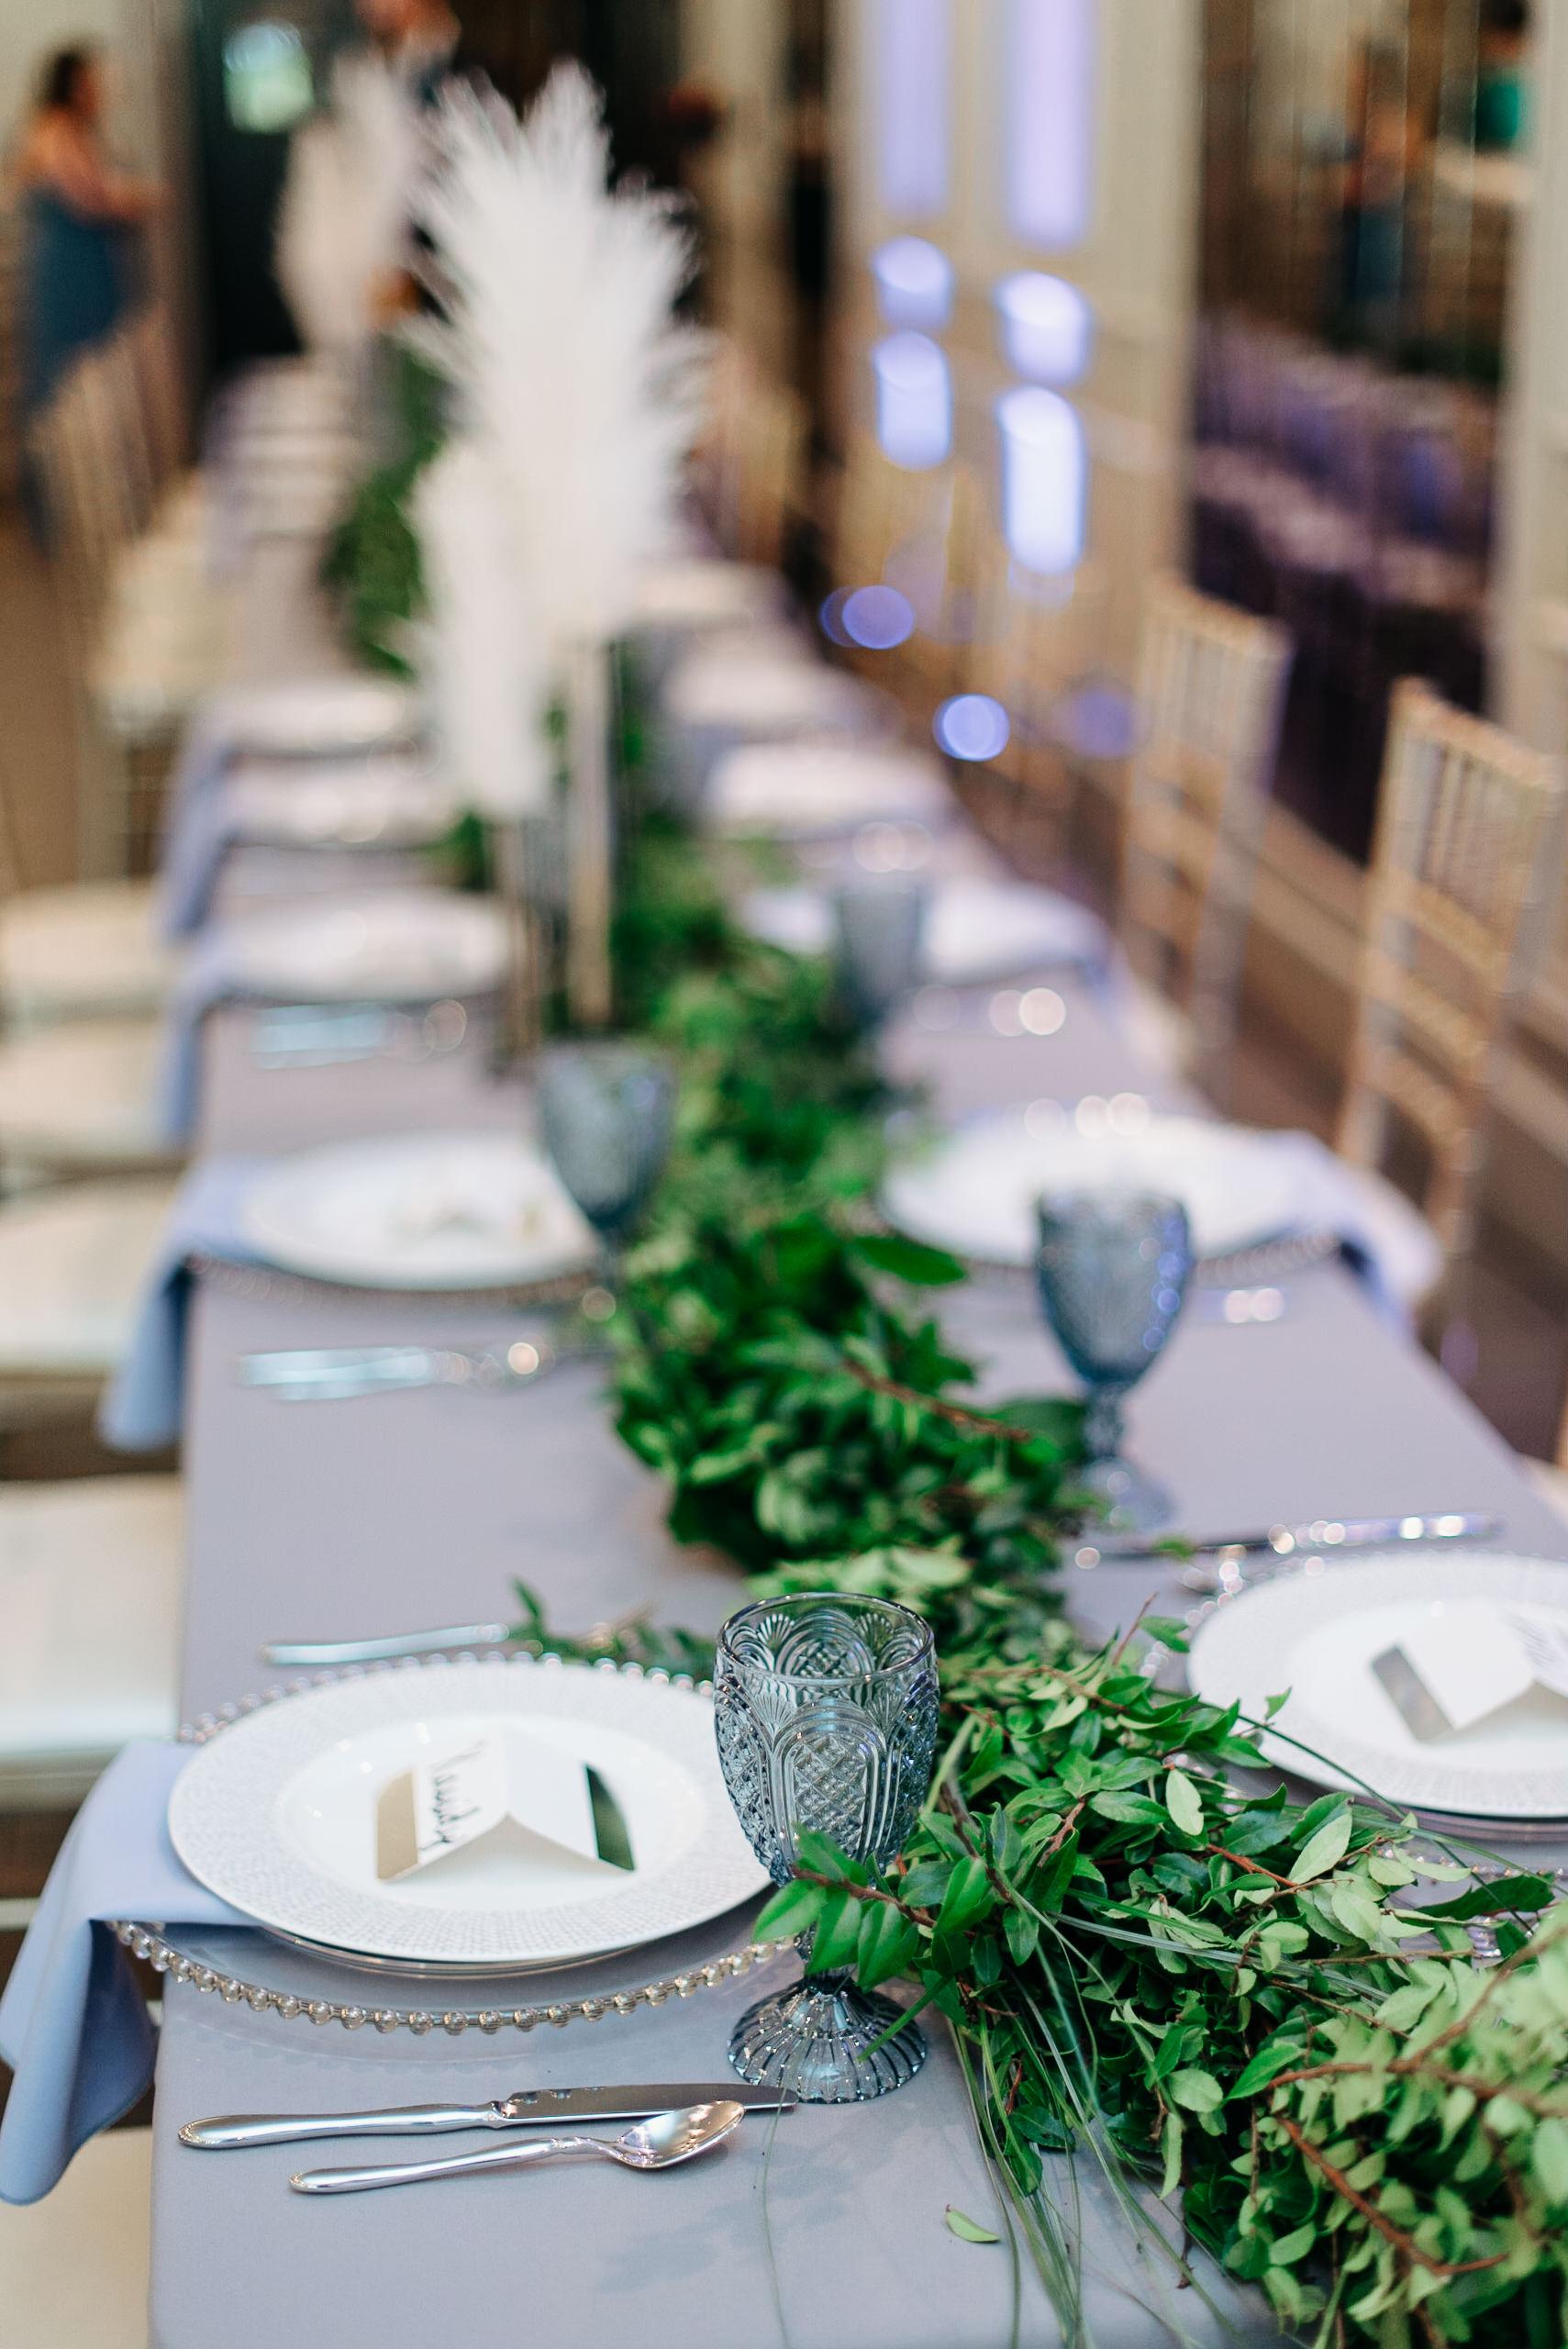 okc-wedding-photographer-coles-garden-wedding-okc-best-wedding-photographers-104.jpg